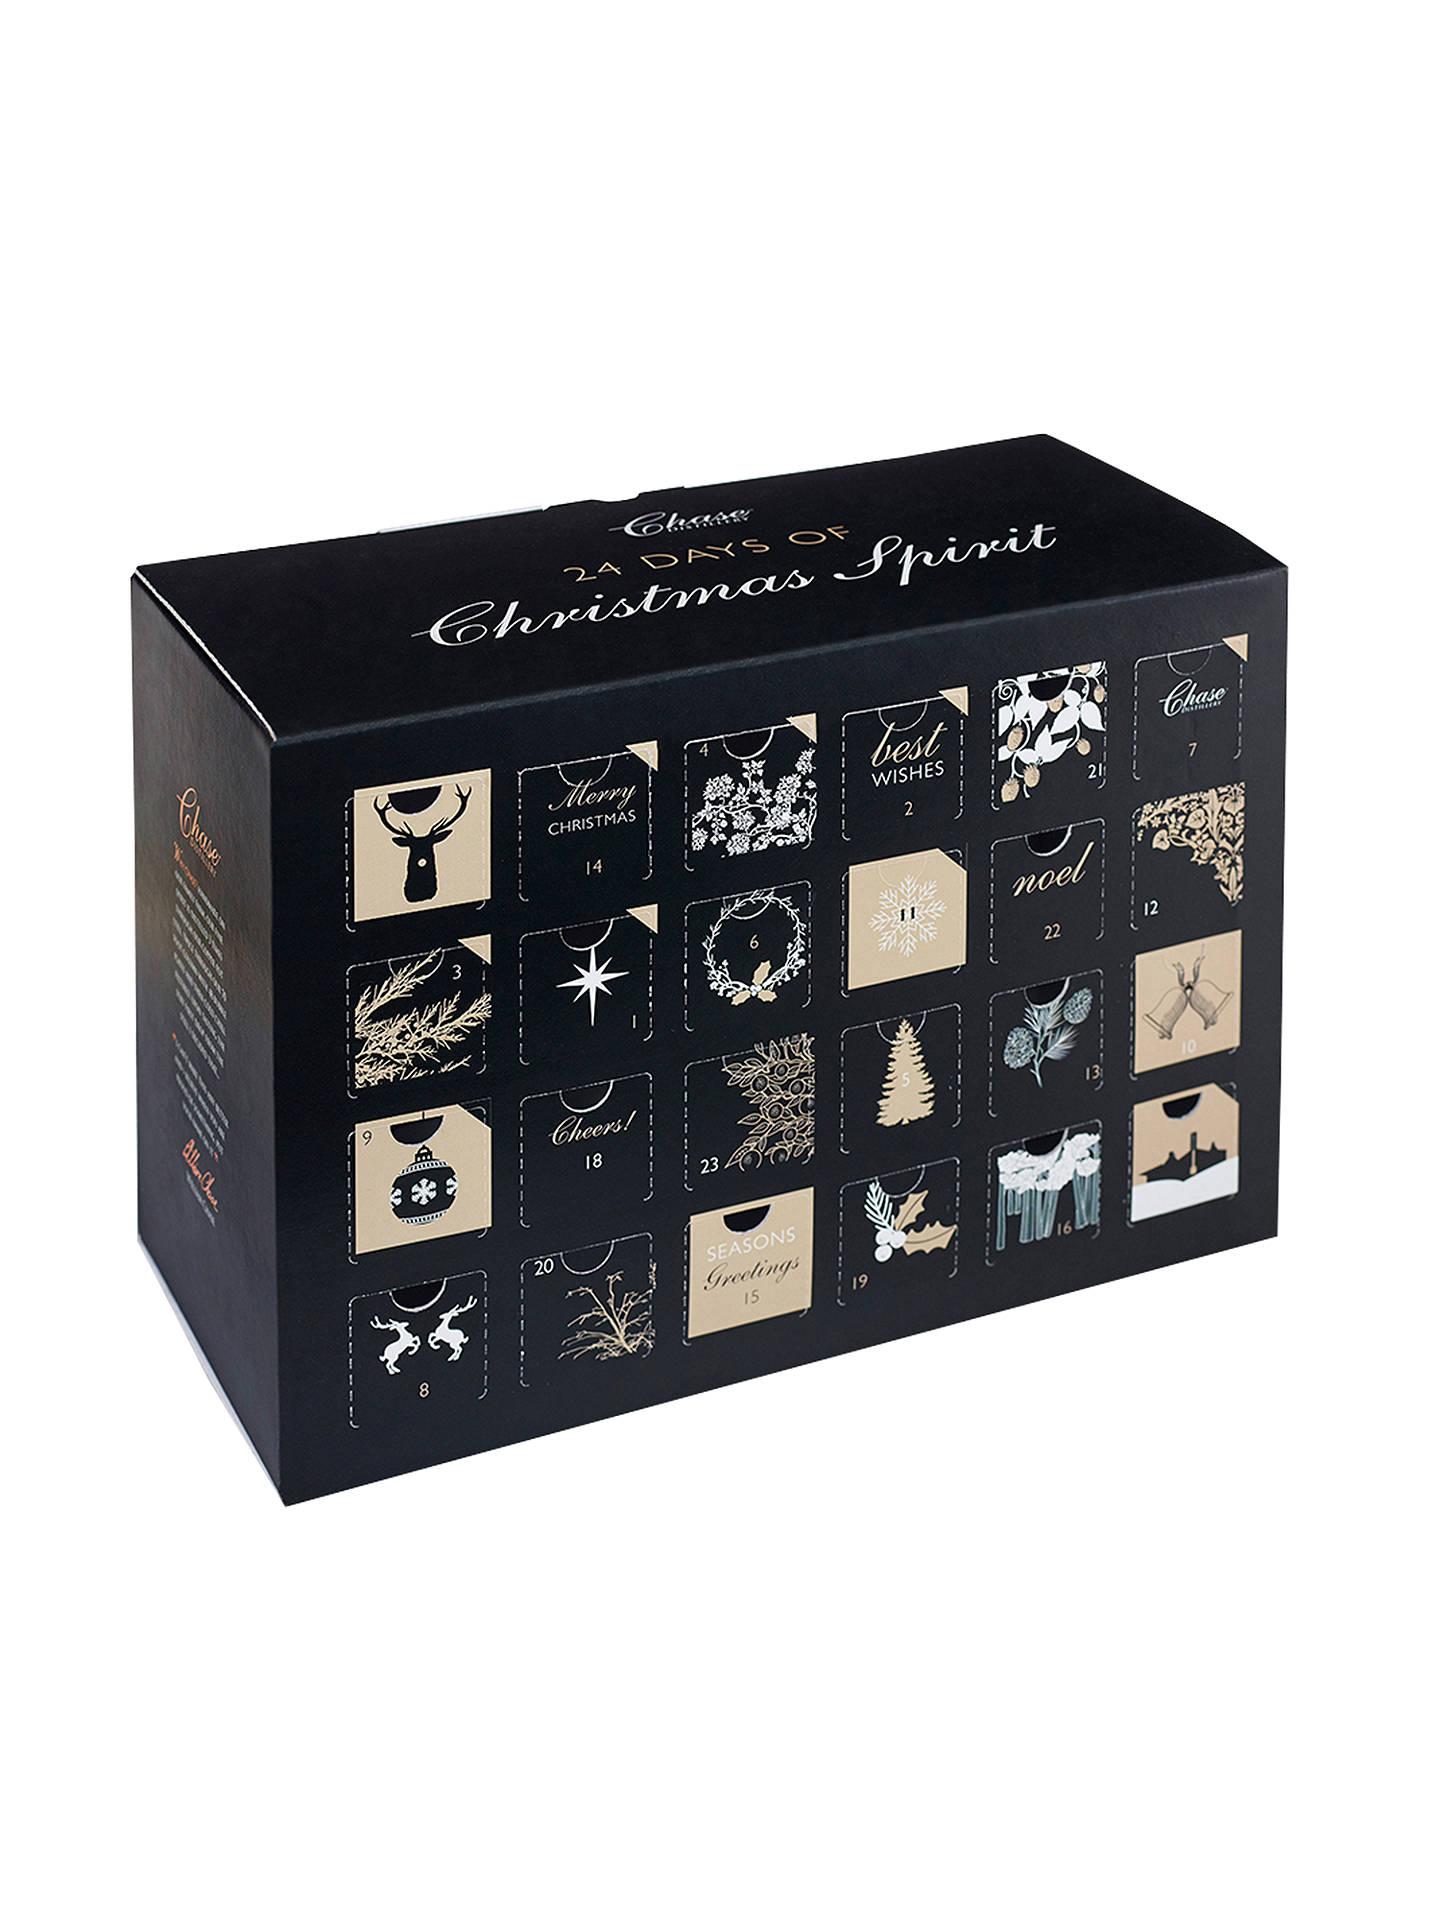 Chase \'24 Days of Christmas Spirit\' Advent Calendar at John Lewis ...